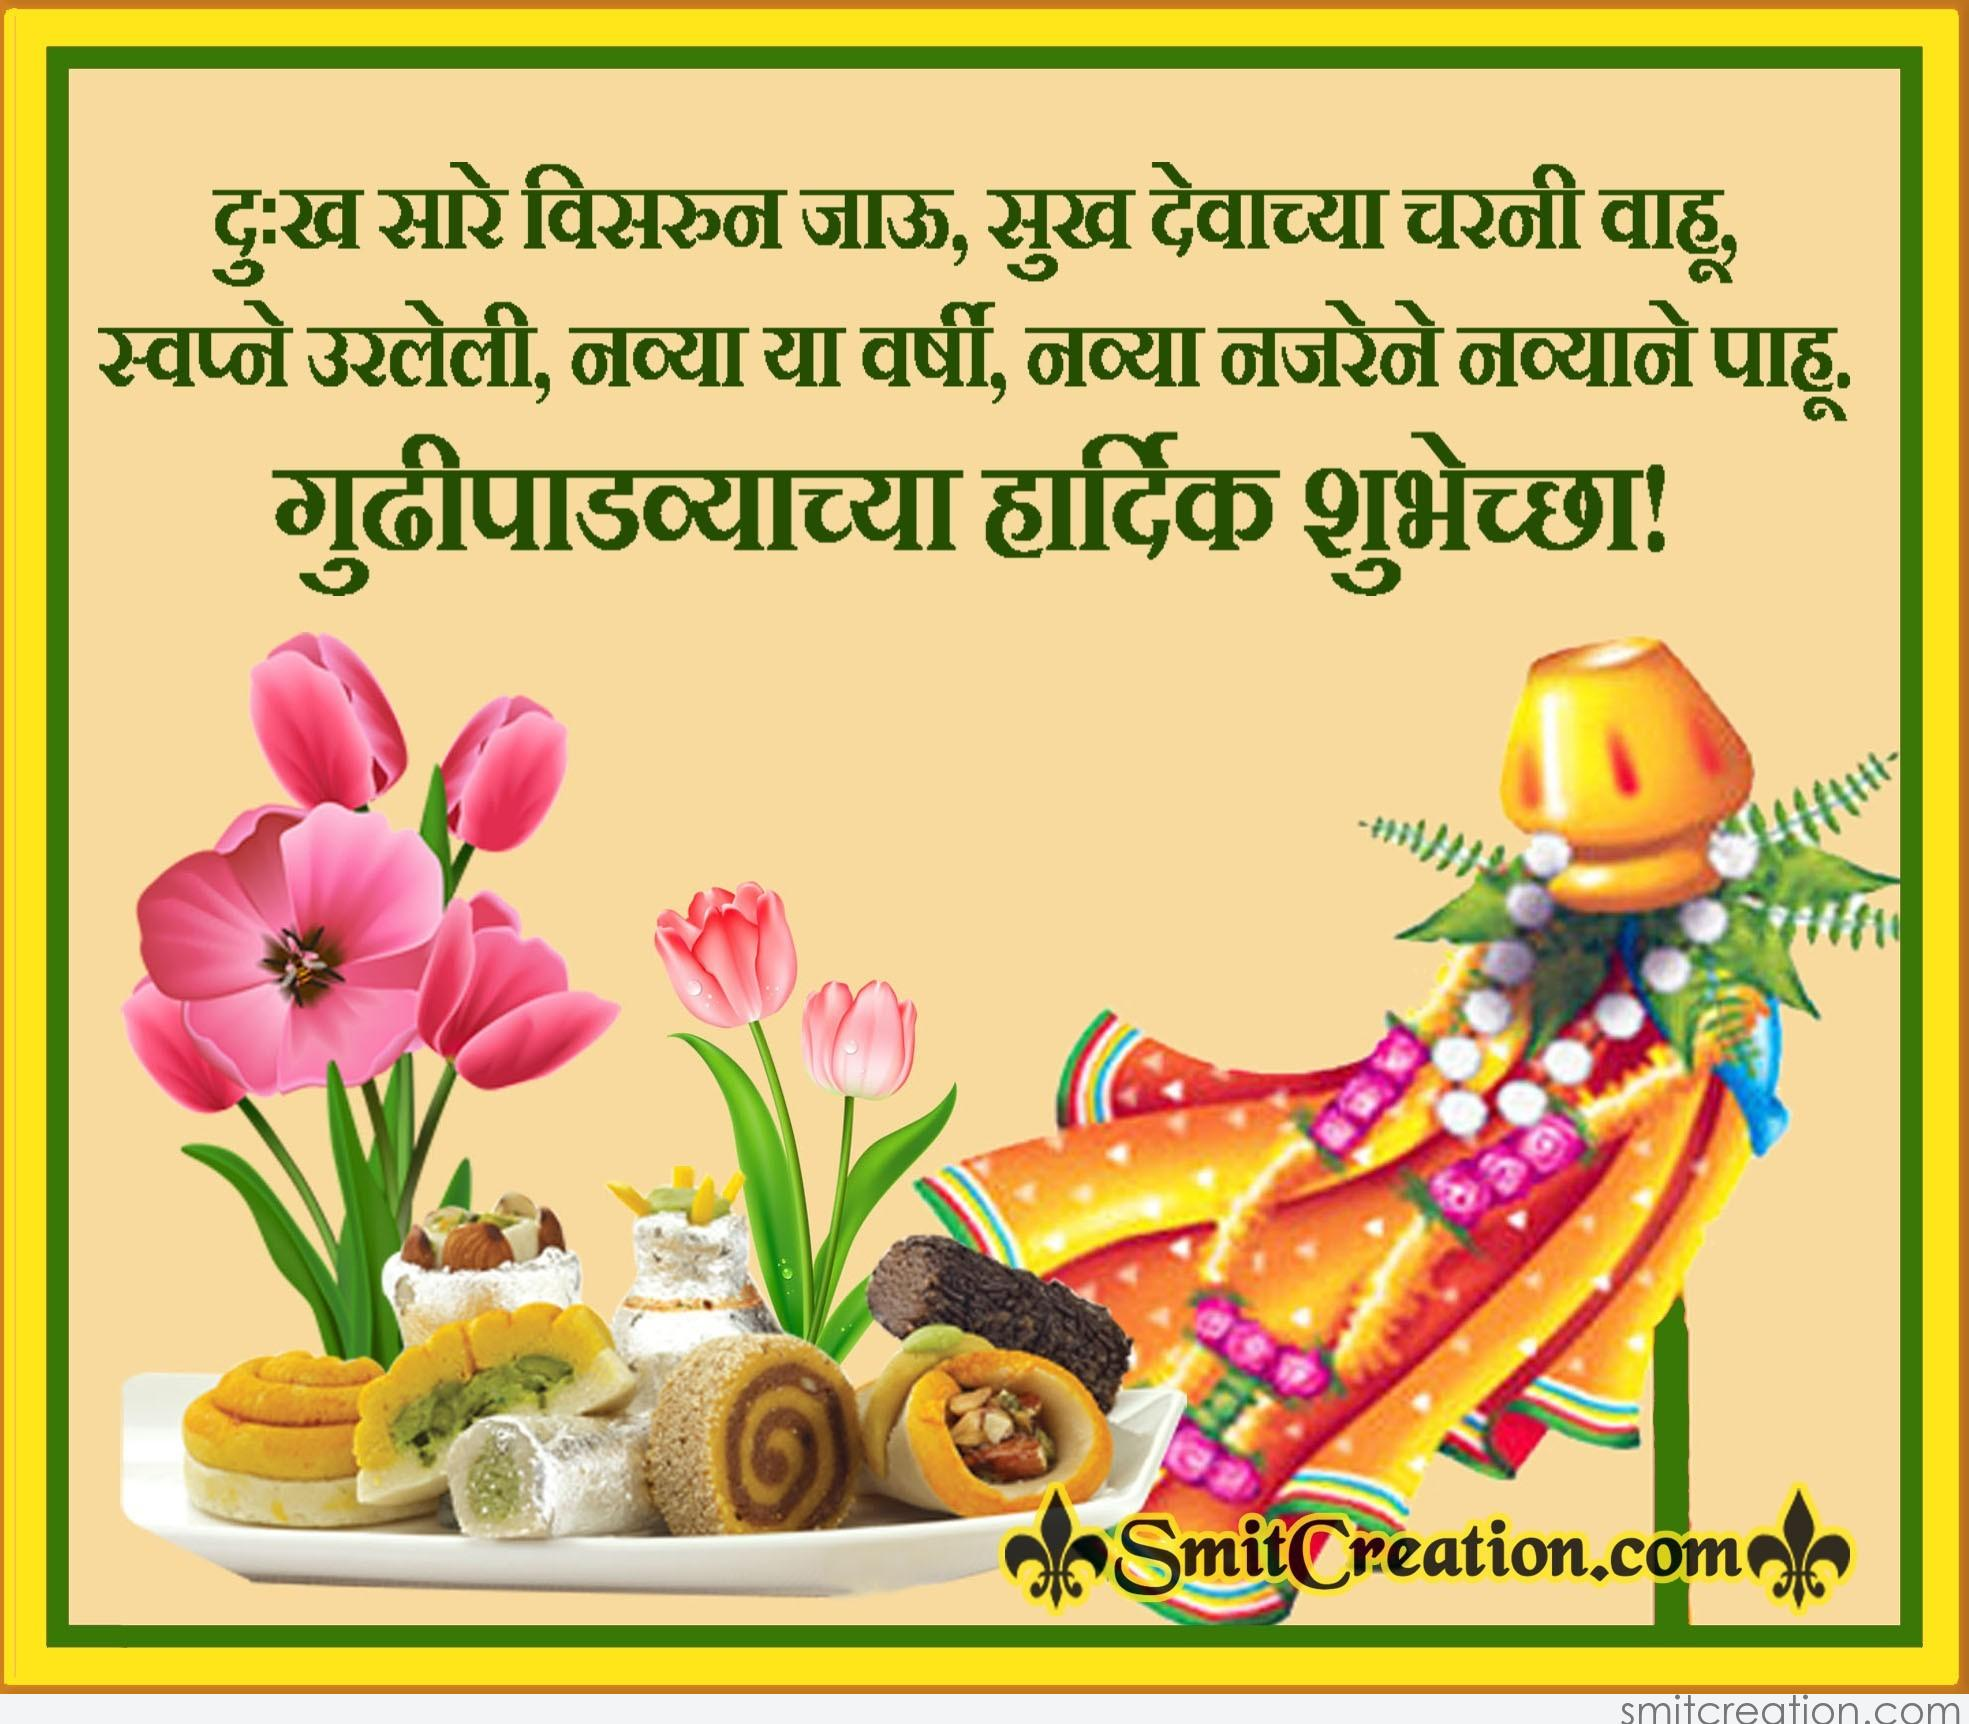 Gudi Padwa Chya Hardik Shubhechha Smitcreation